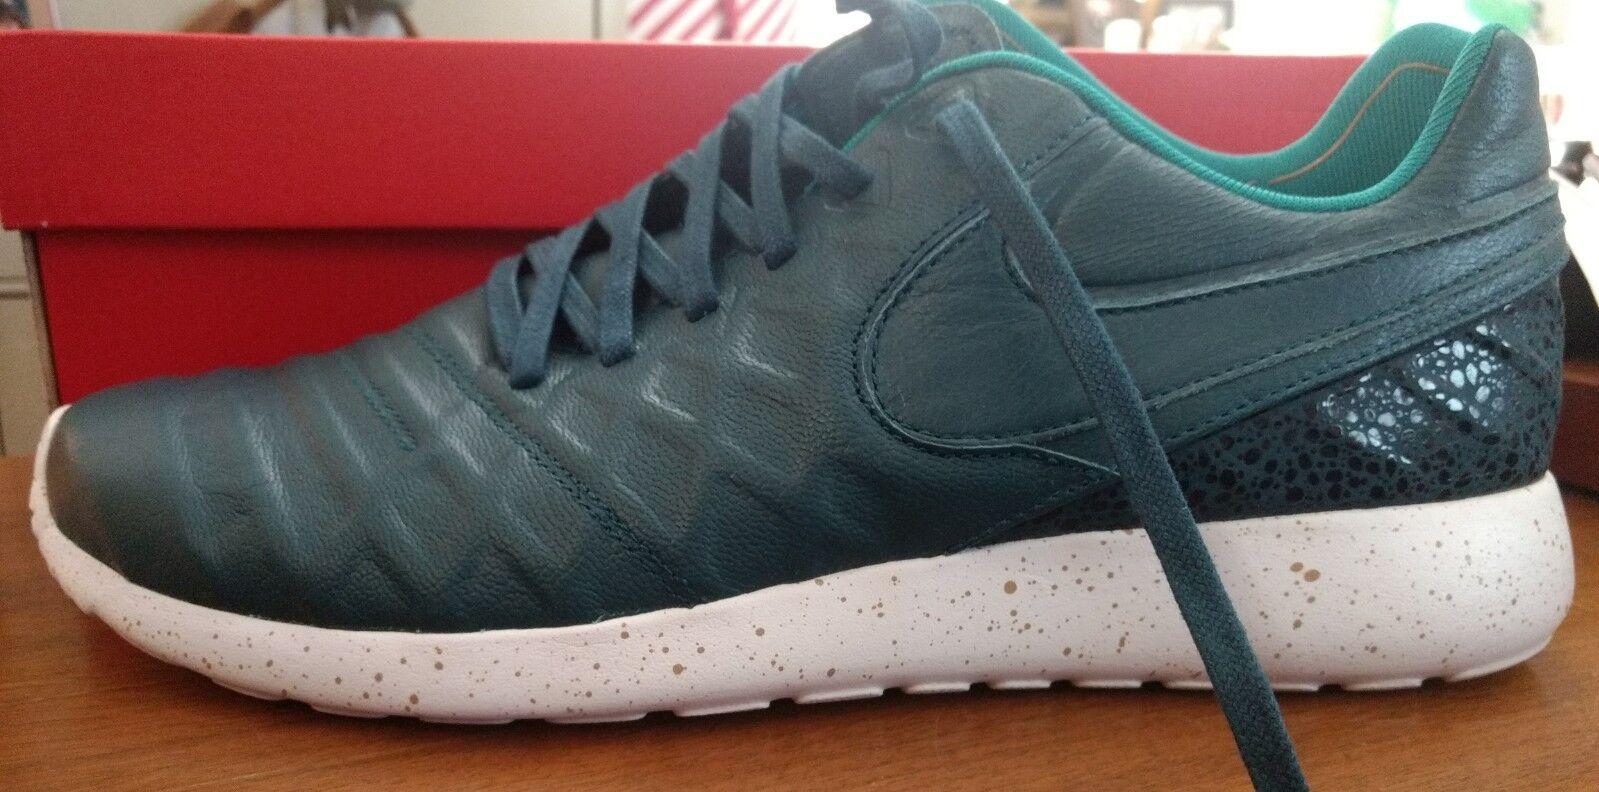 Nike Roshe Tiempo Midnight Turquoise Shoes 11.5 NIB